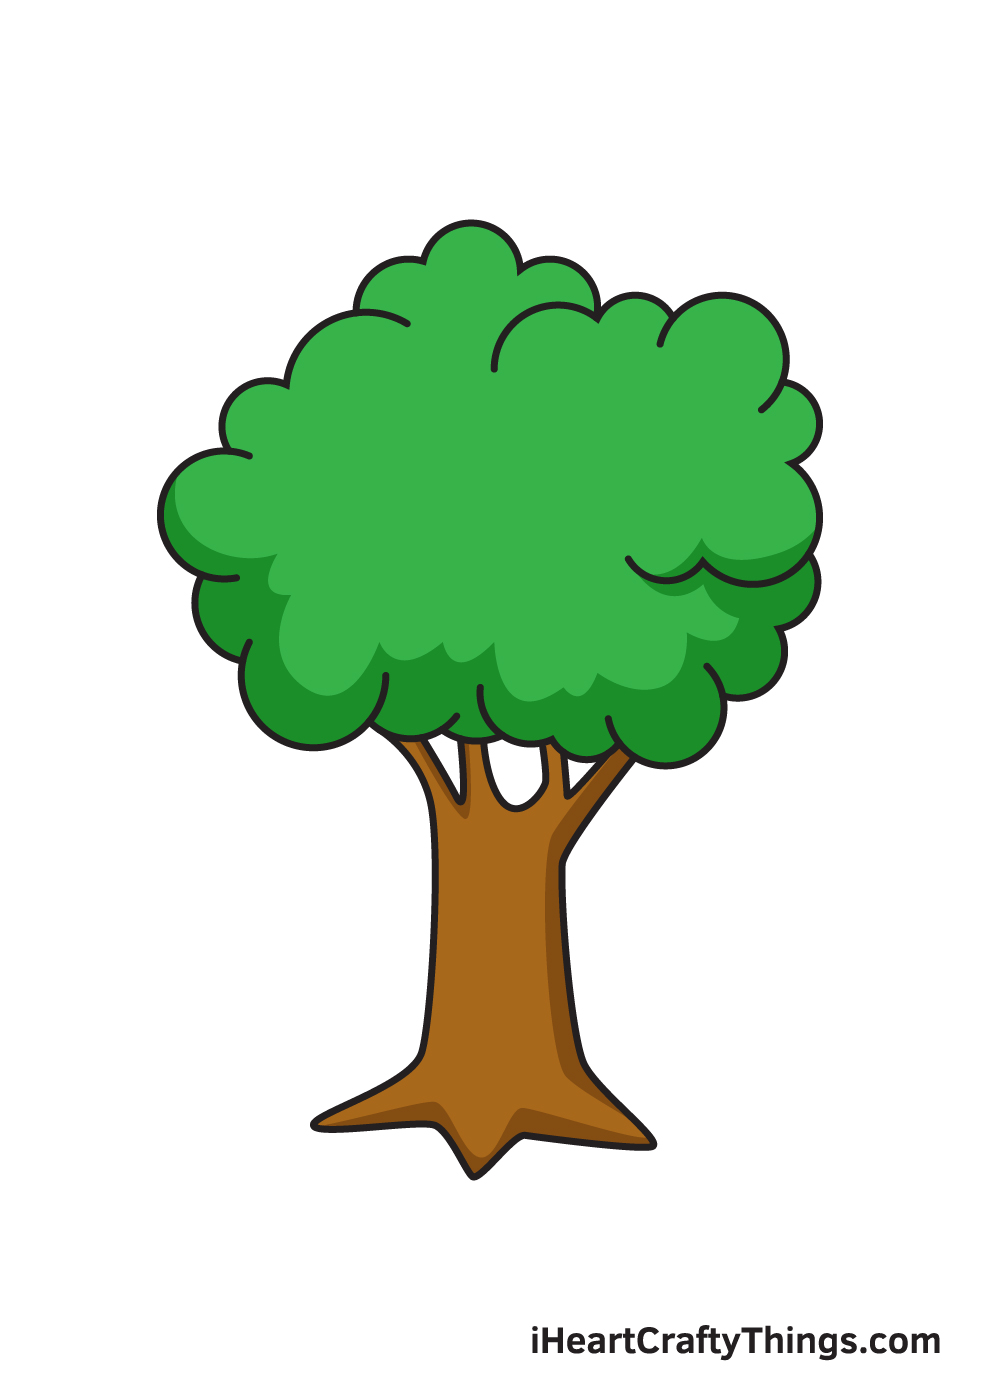 tree drawing 9 steps